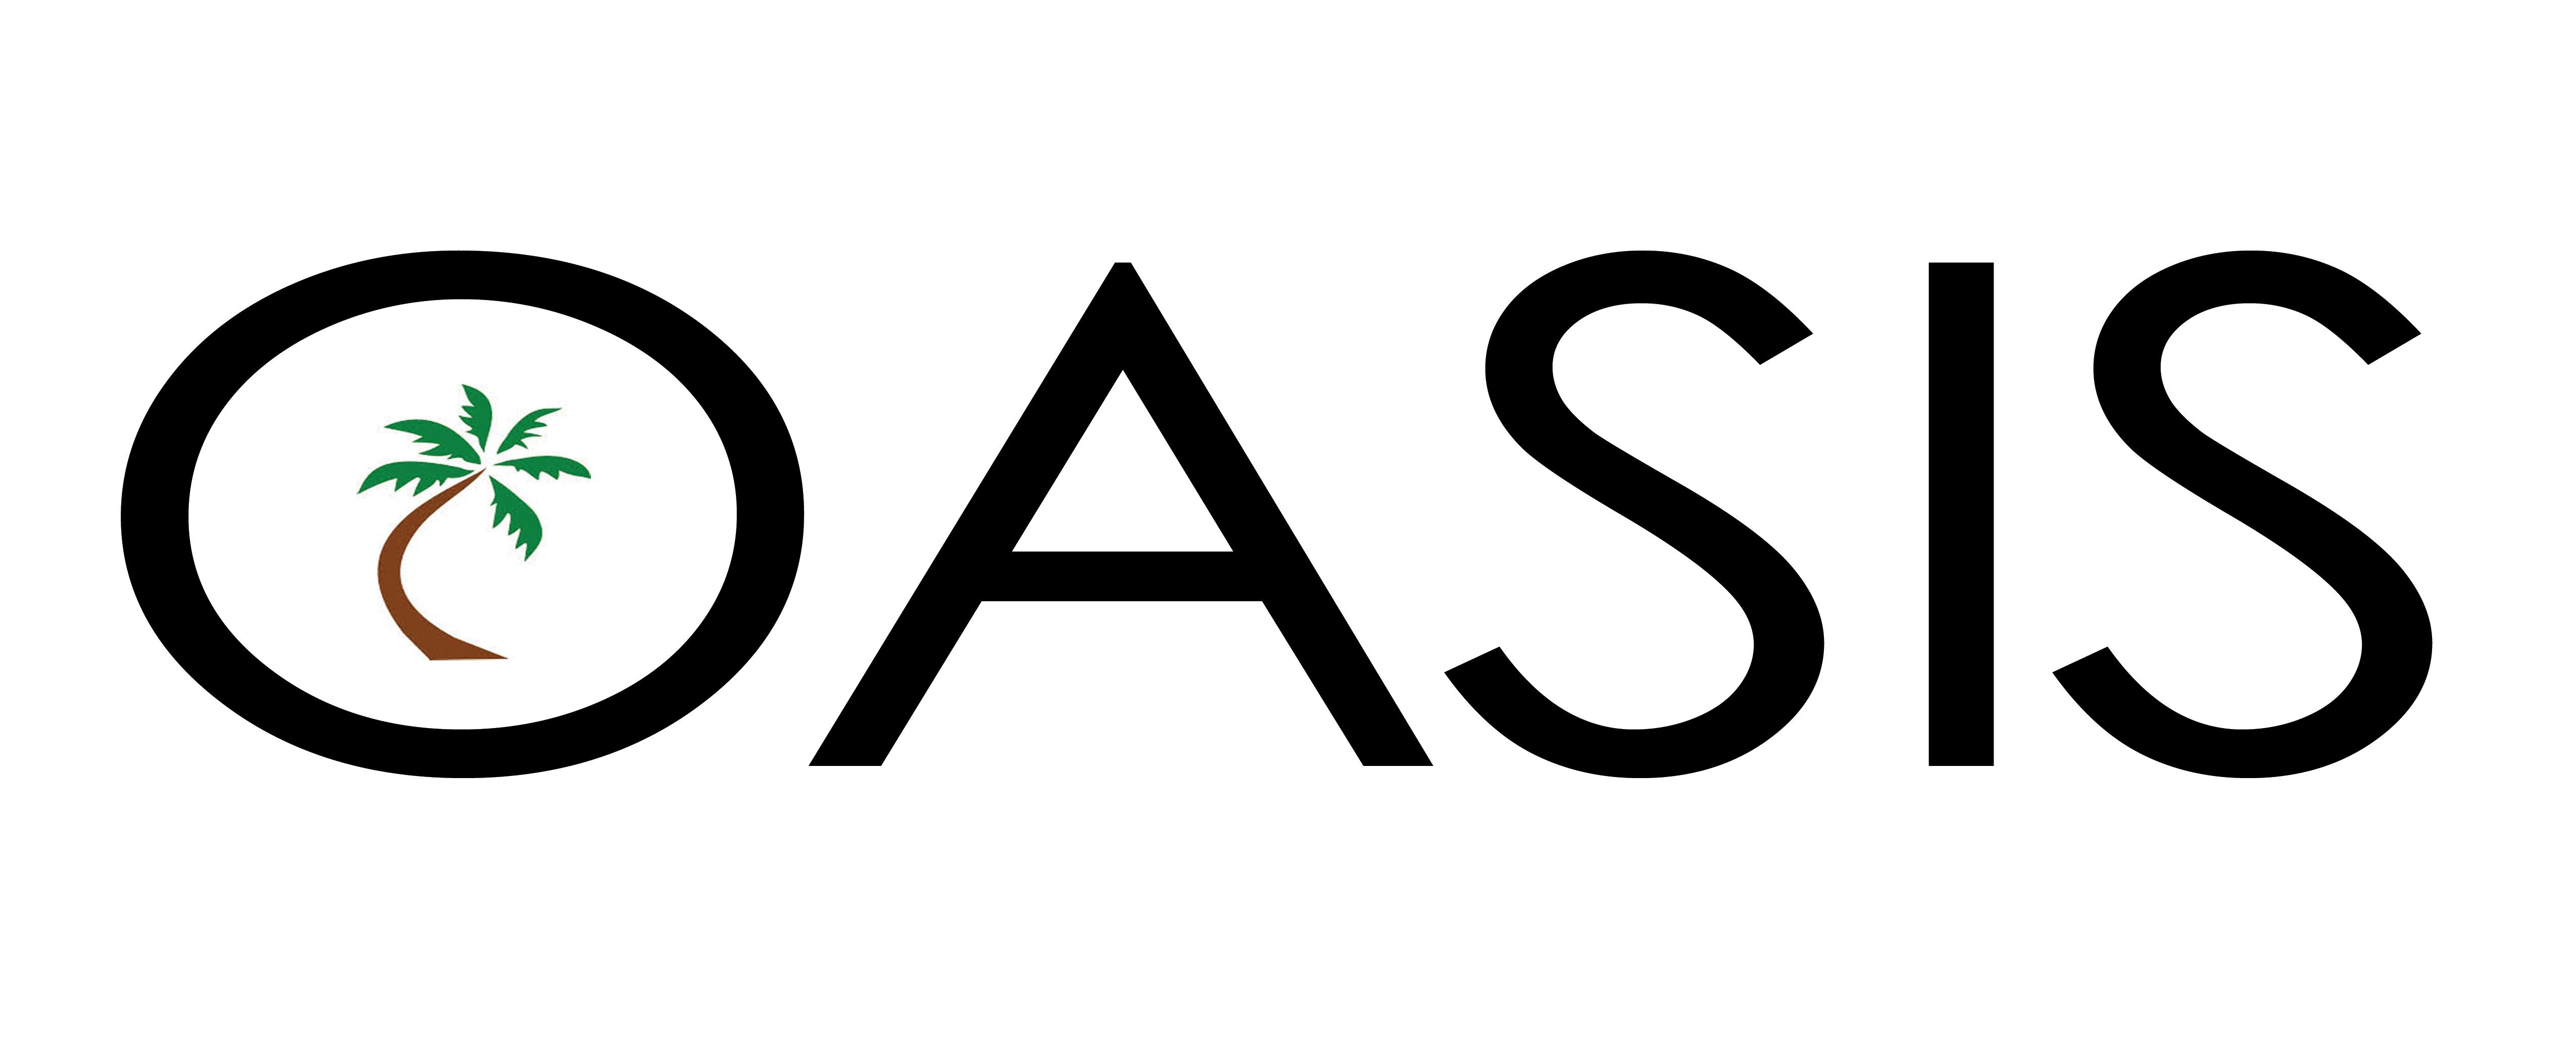 Beverly Hills outdoor tv - 55 inch outdoor tv - Home ... Oasis Logo